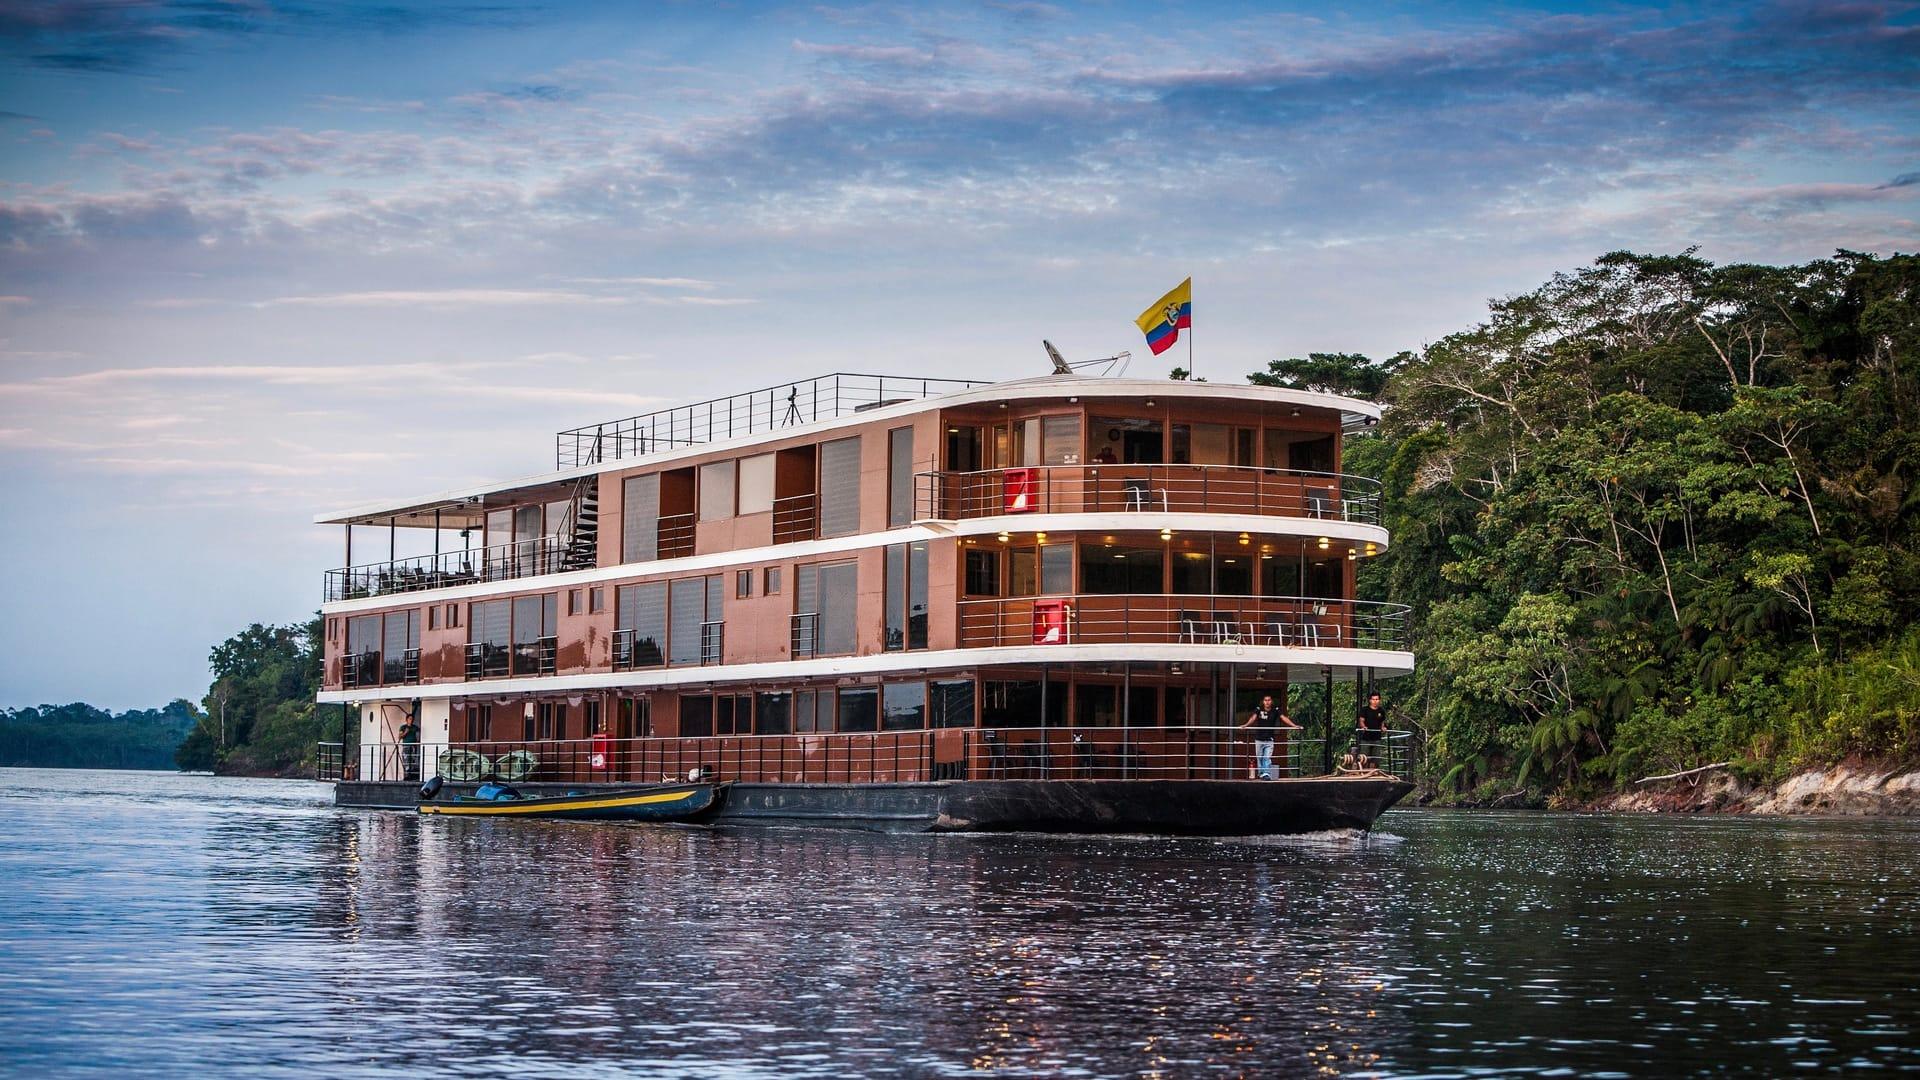 anakonda boat